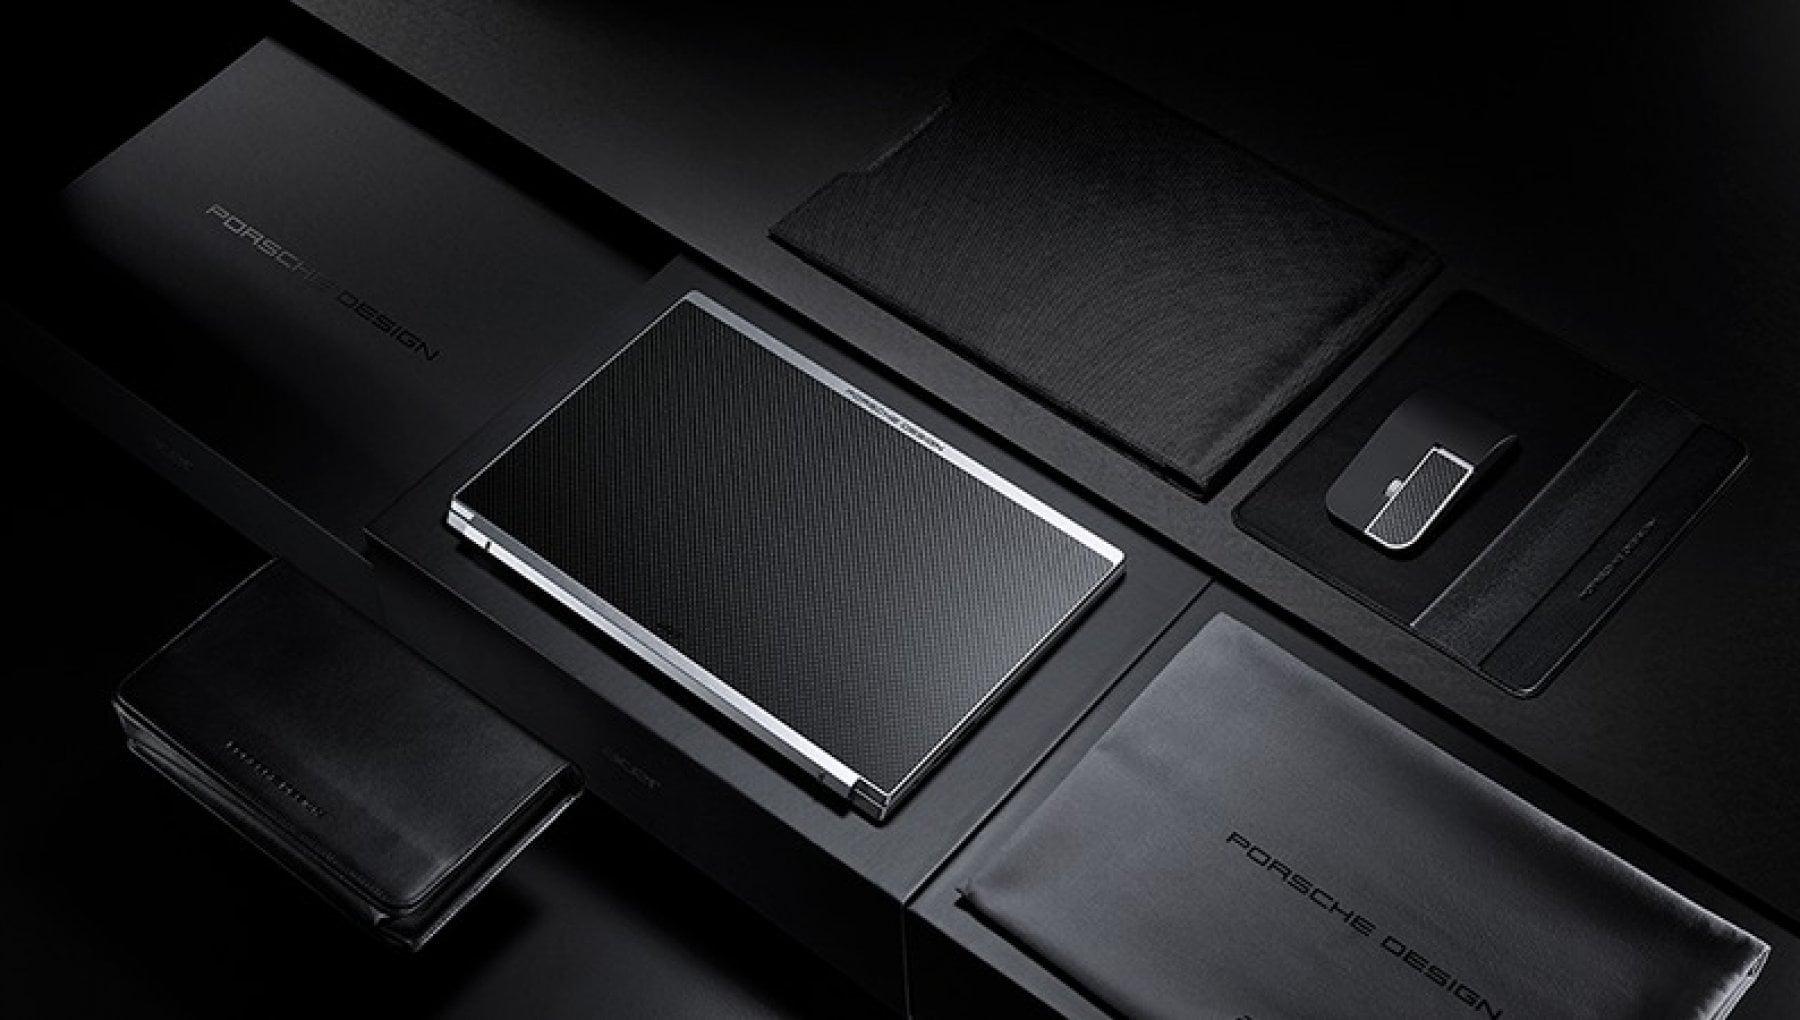 Laptop, ecco il Porsche Design Acer Book RS